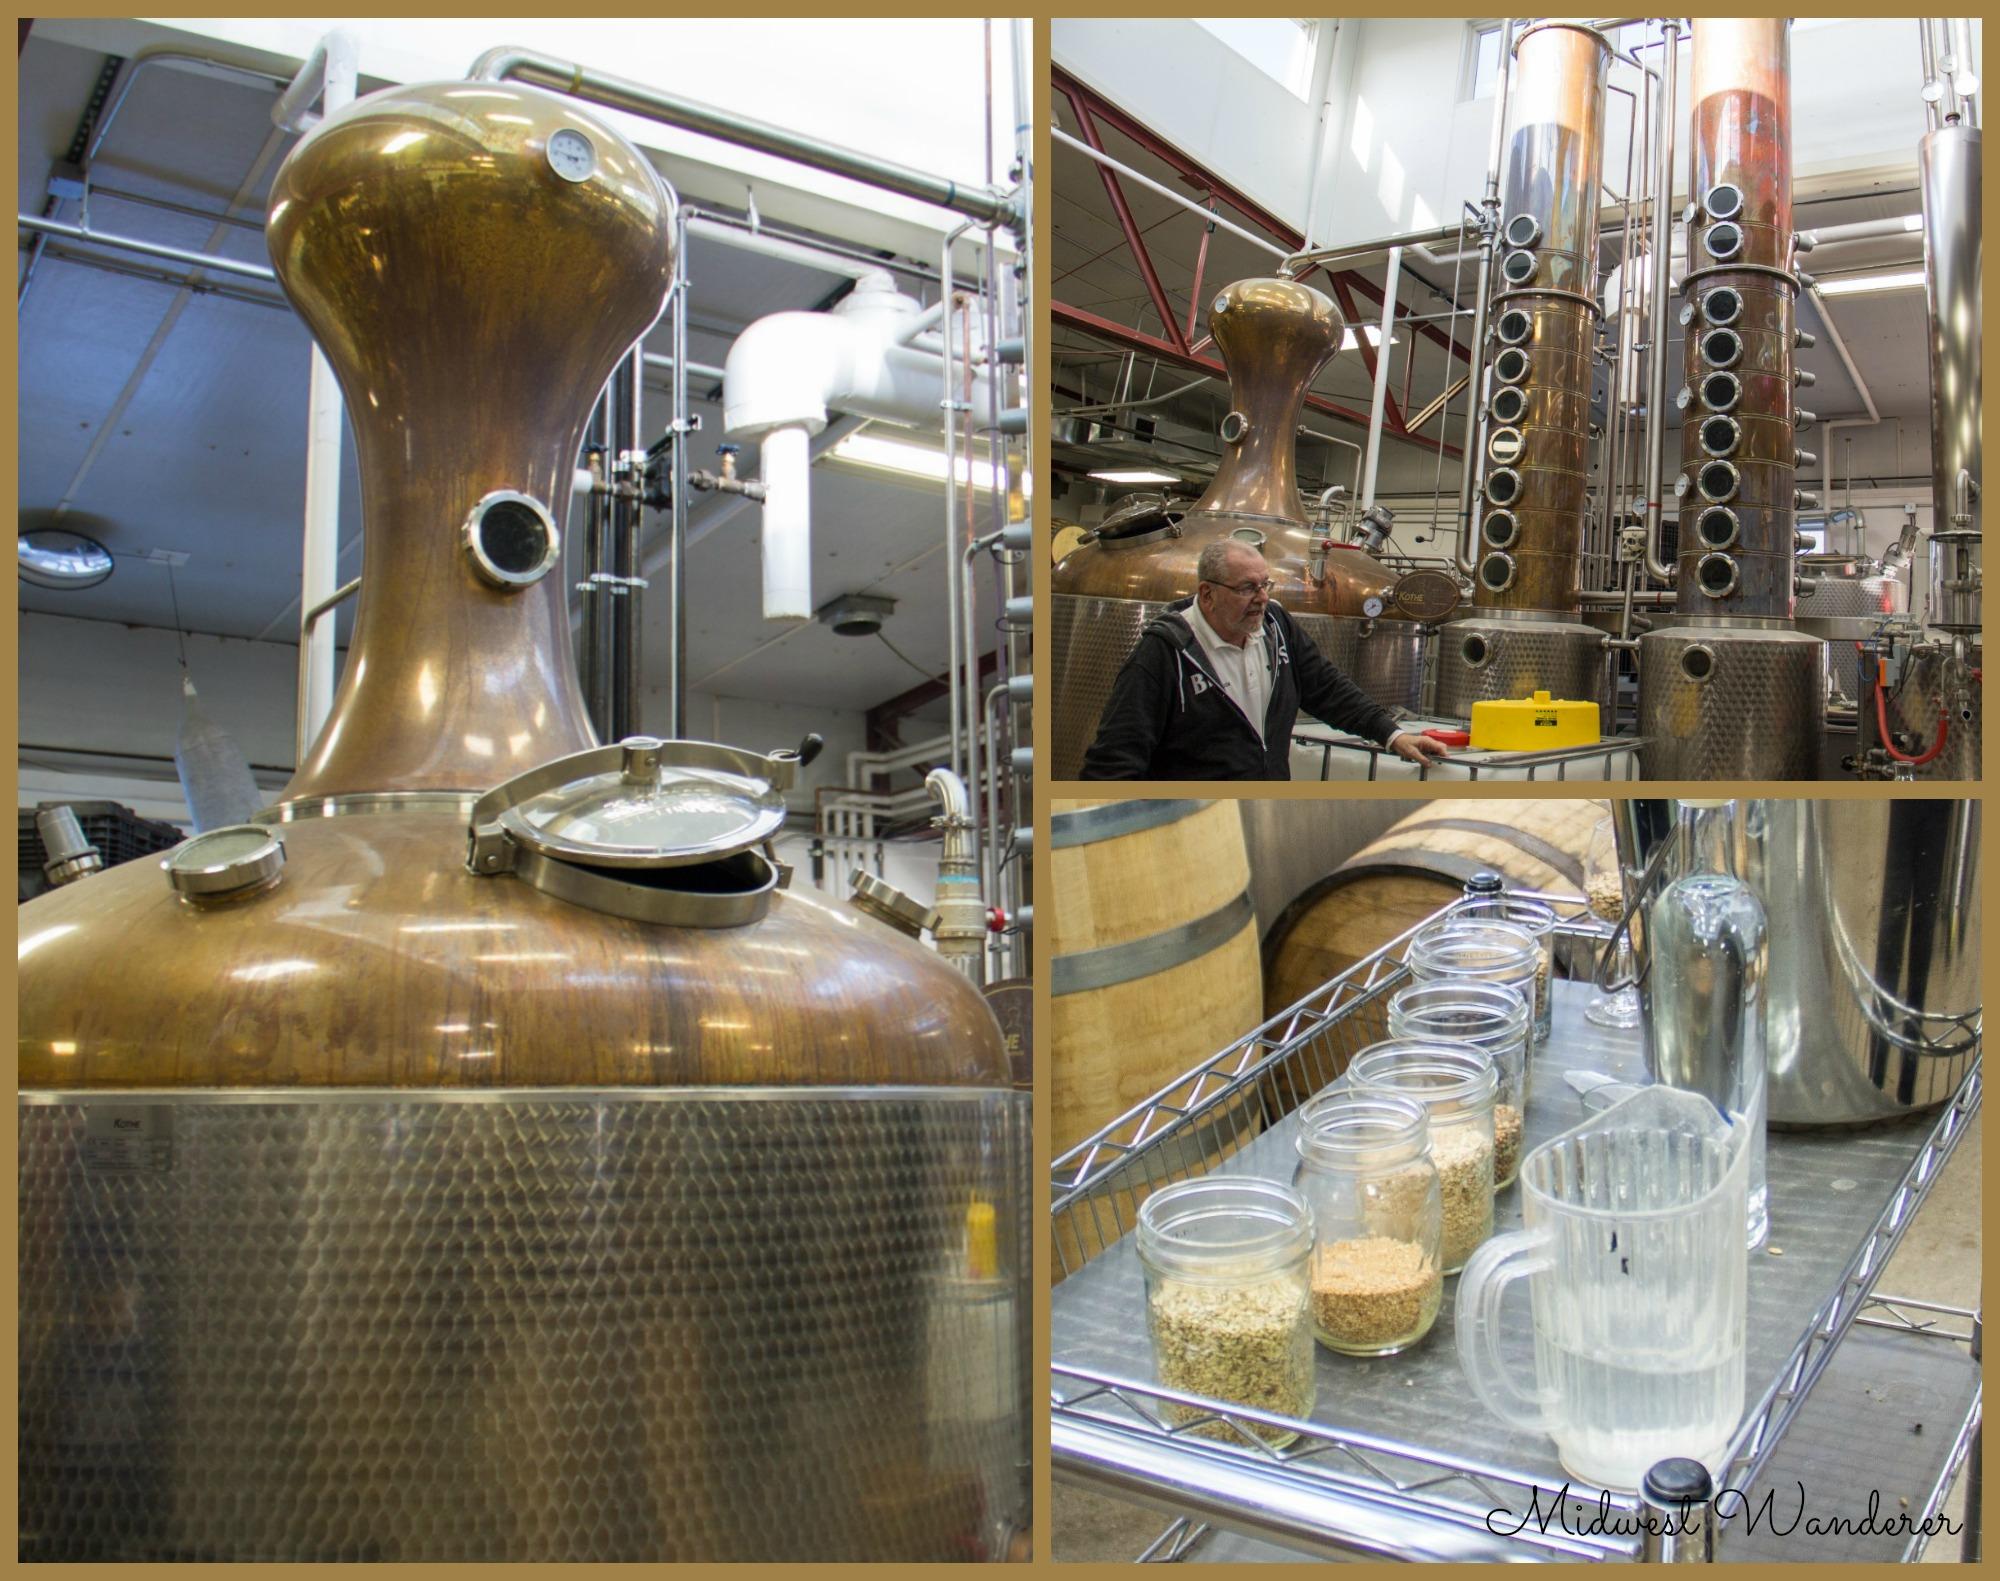 Blaus Bros Distilling Co tour